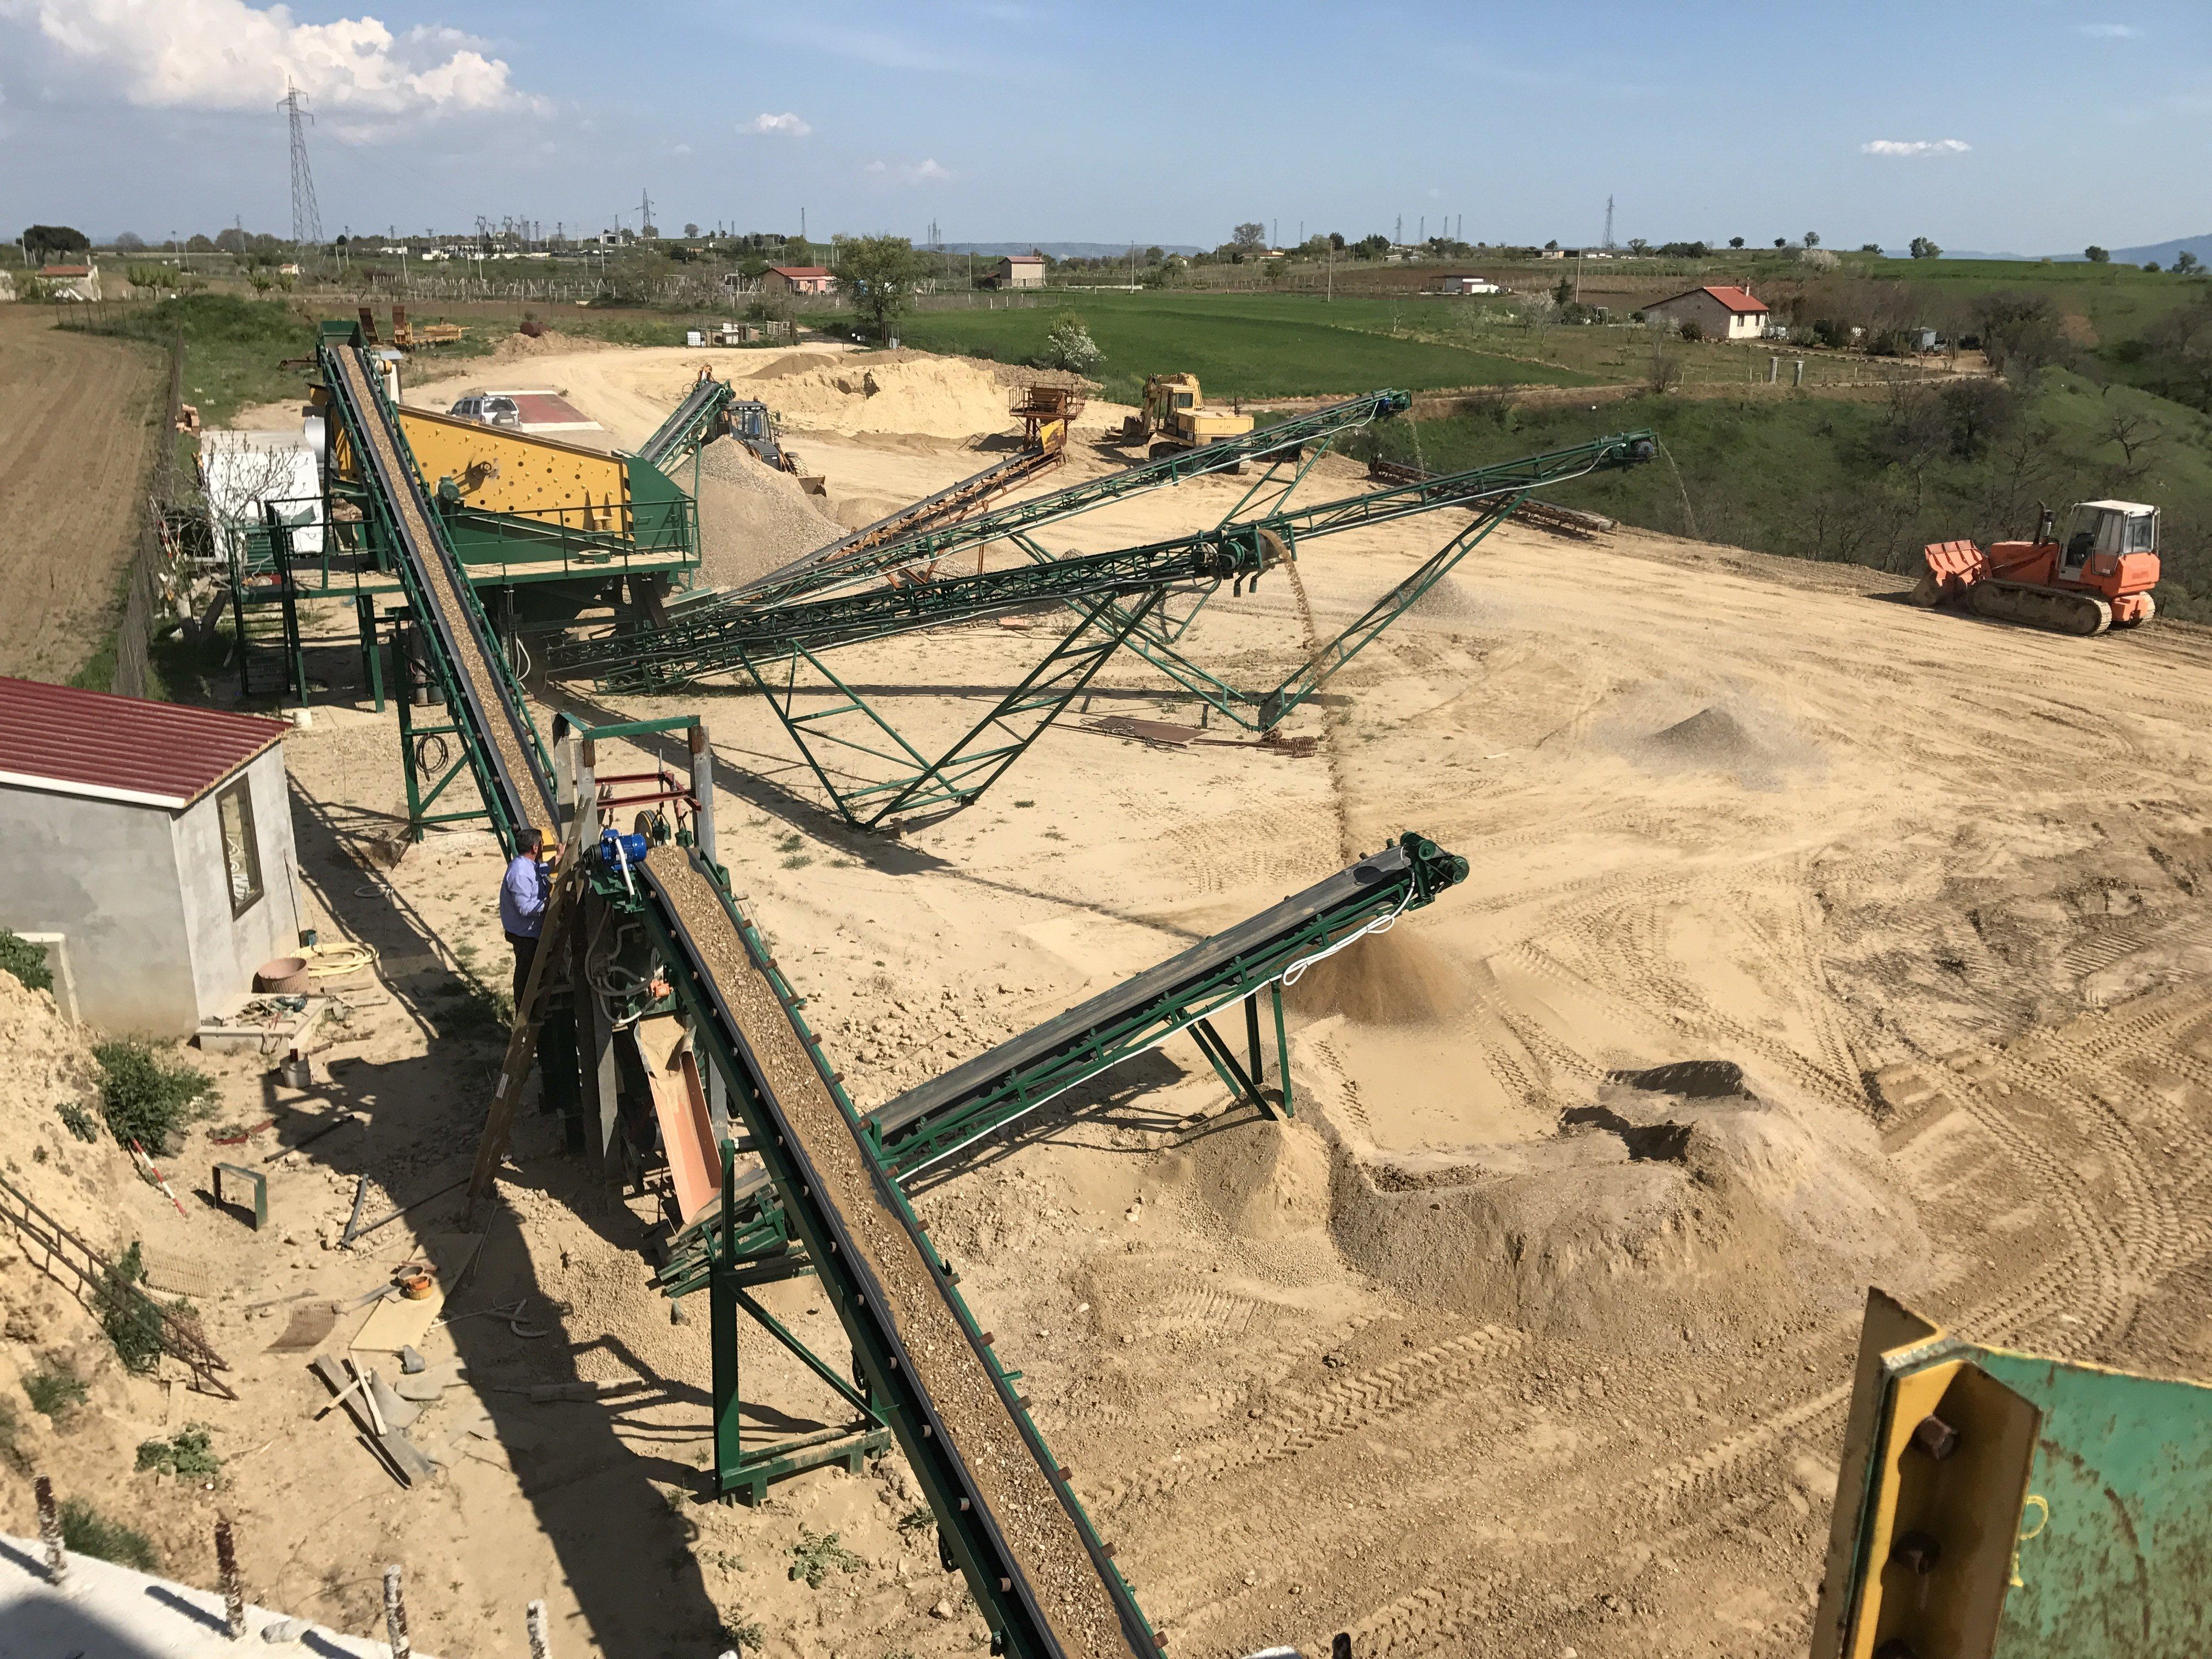 casa macchinari sabbia terreno